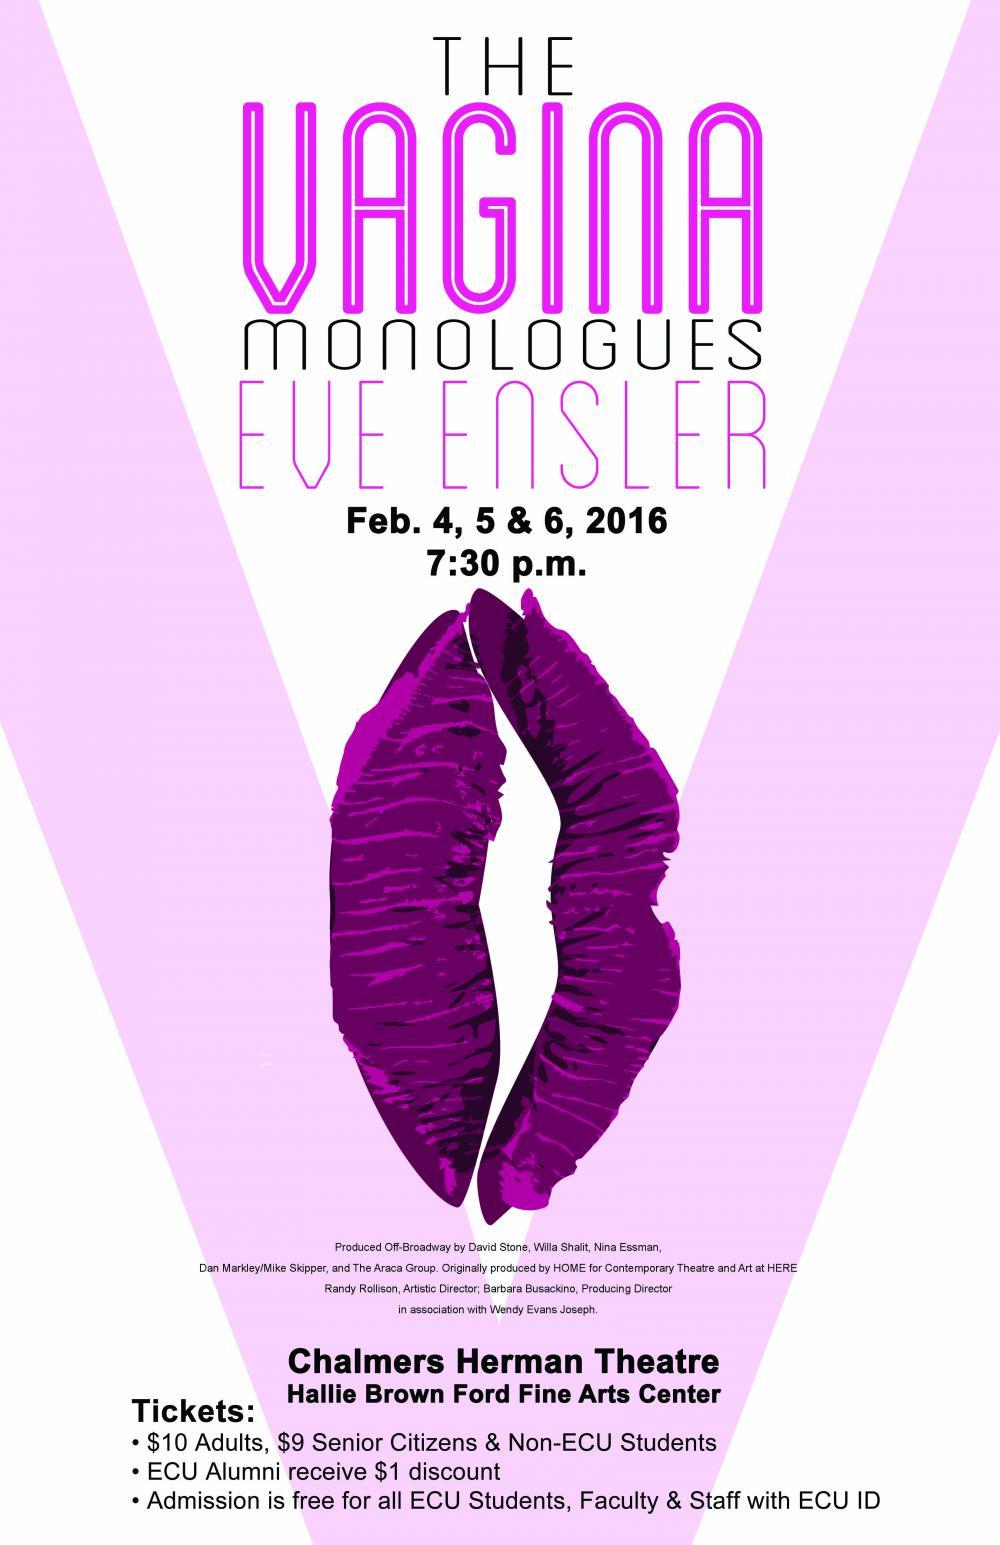 the-vagina-monologues_40385151112_o